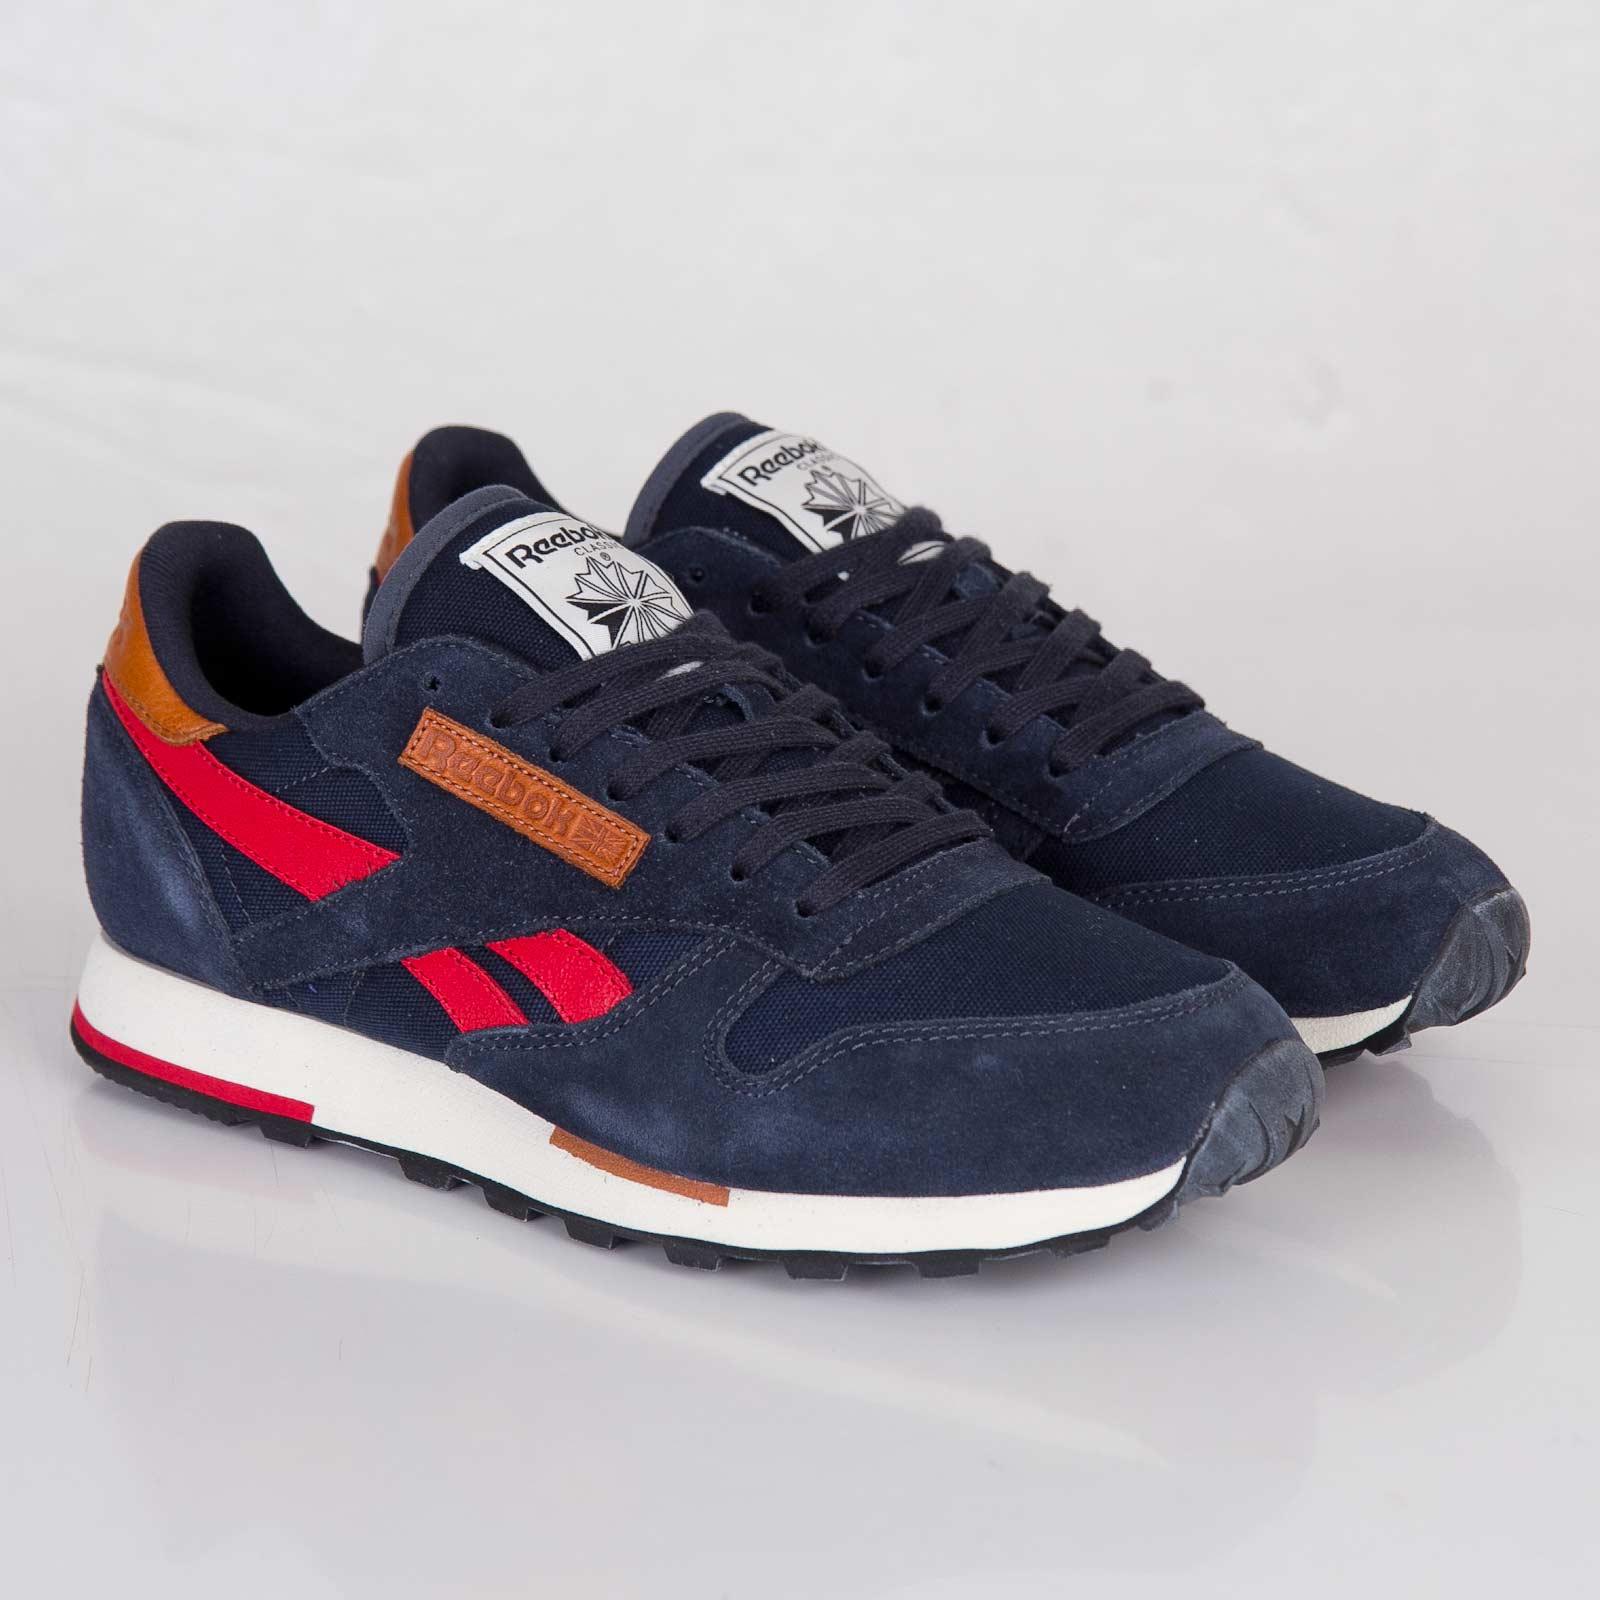 a4df10380722b Reebok Classic Leather Utility - V55385 - Sneakersnstuff